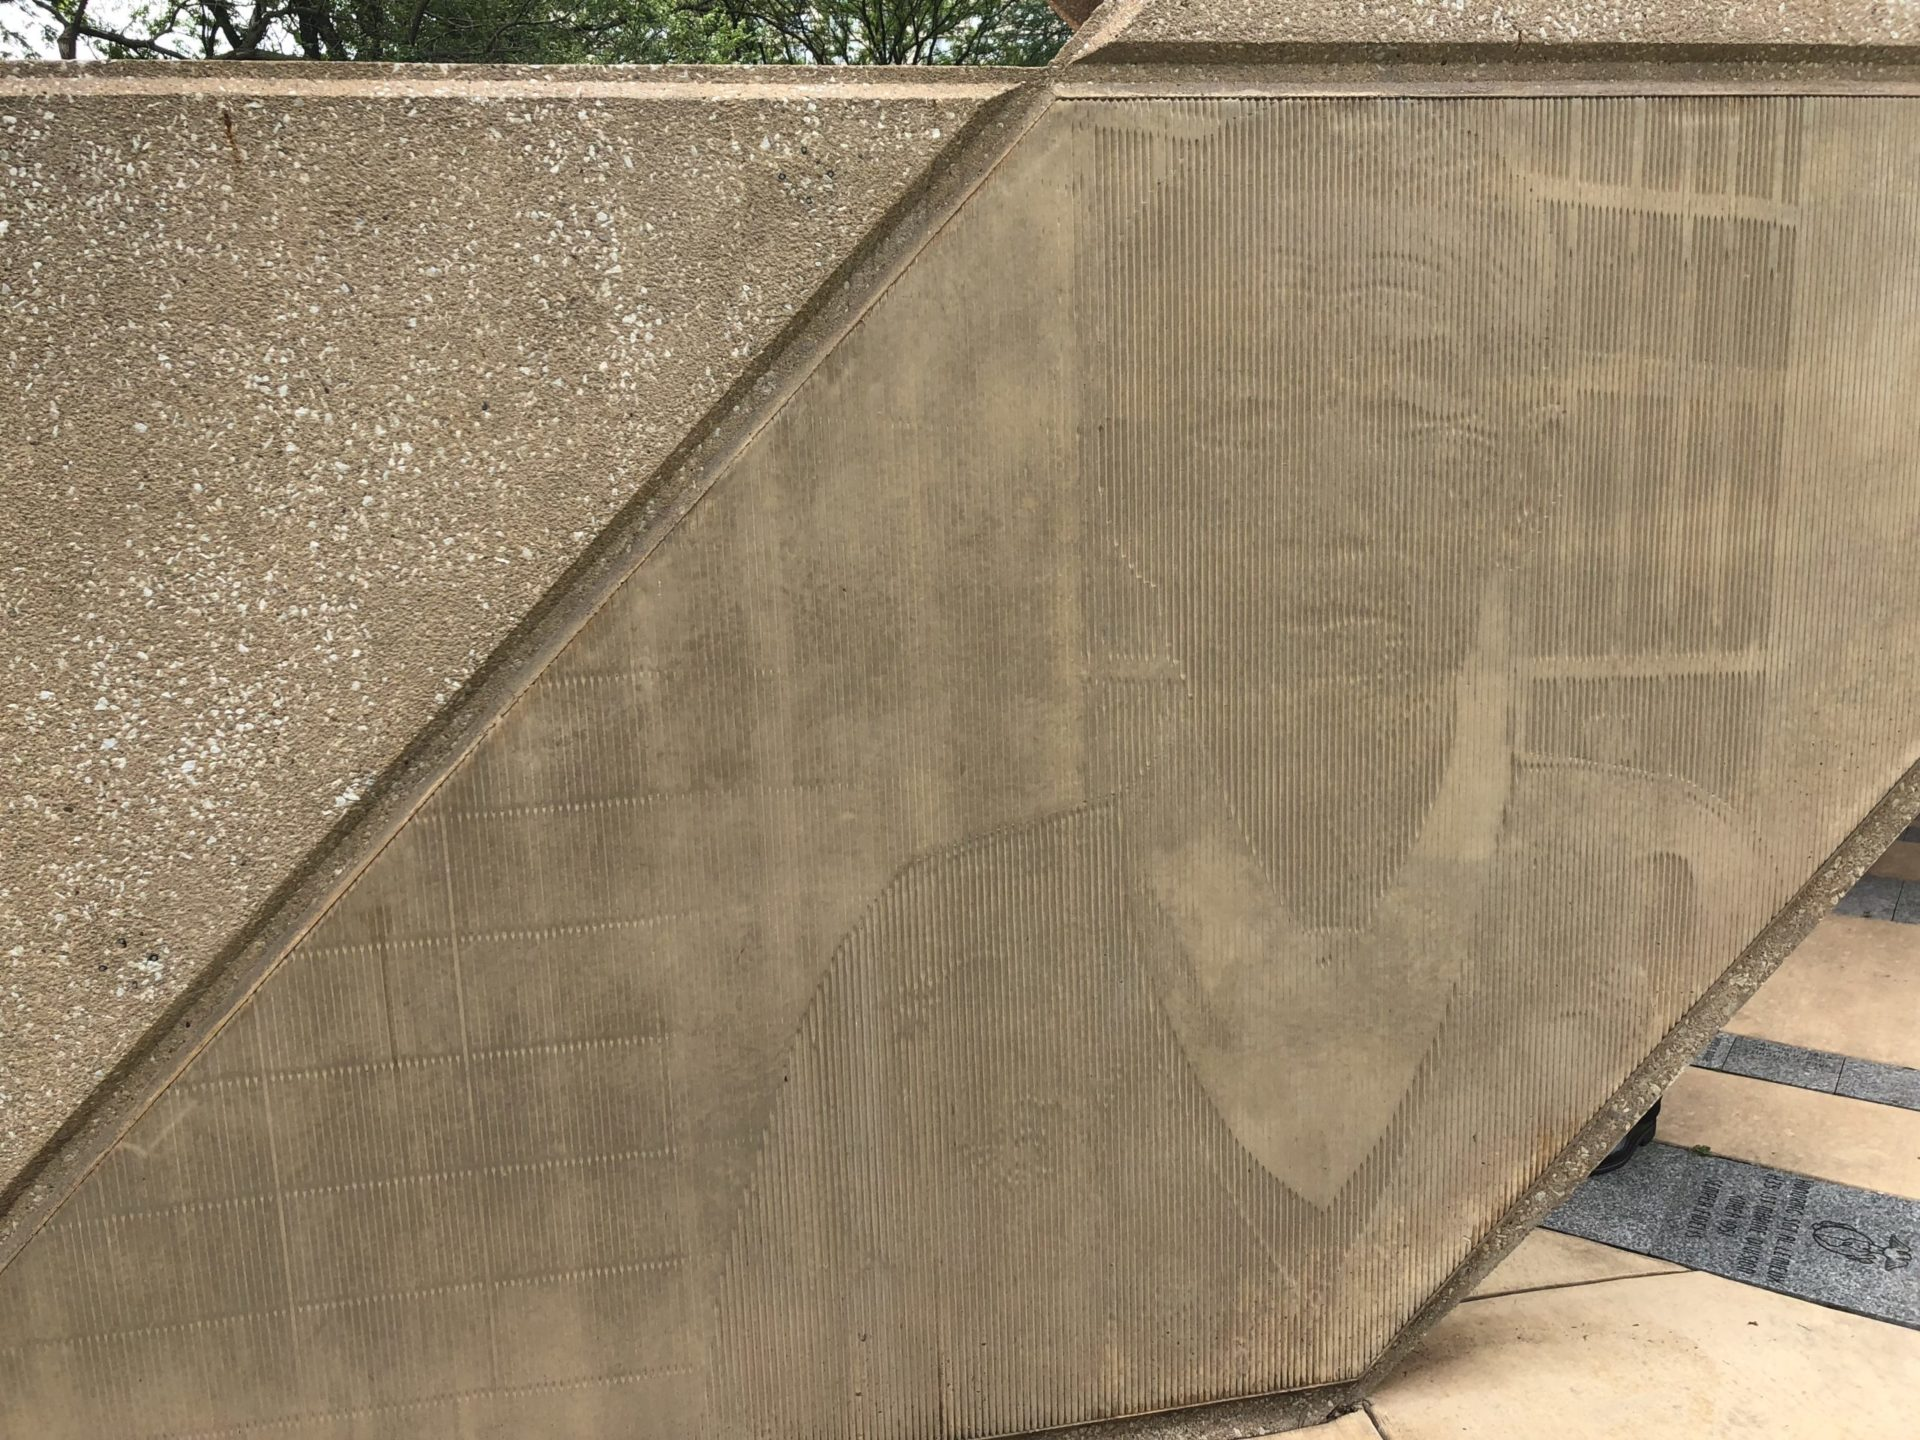 Korean War Memorials - Kansas City